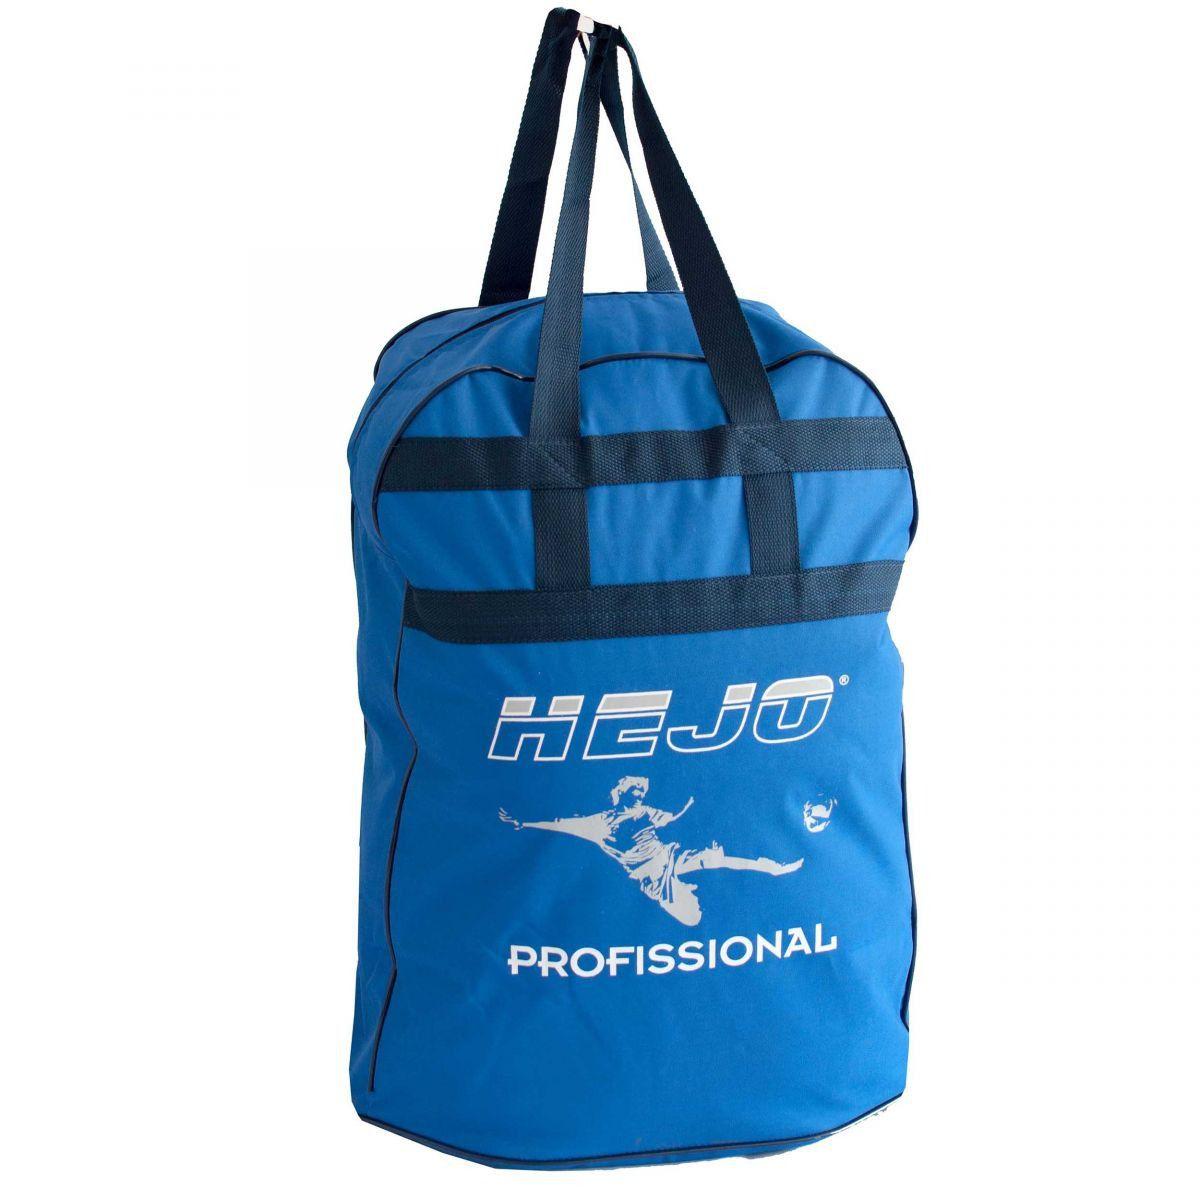 Bolsa Fardamento Futebol Profissional 2 Jogos Uniformes - Cor Azul Claro